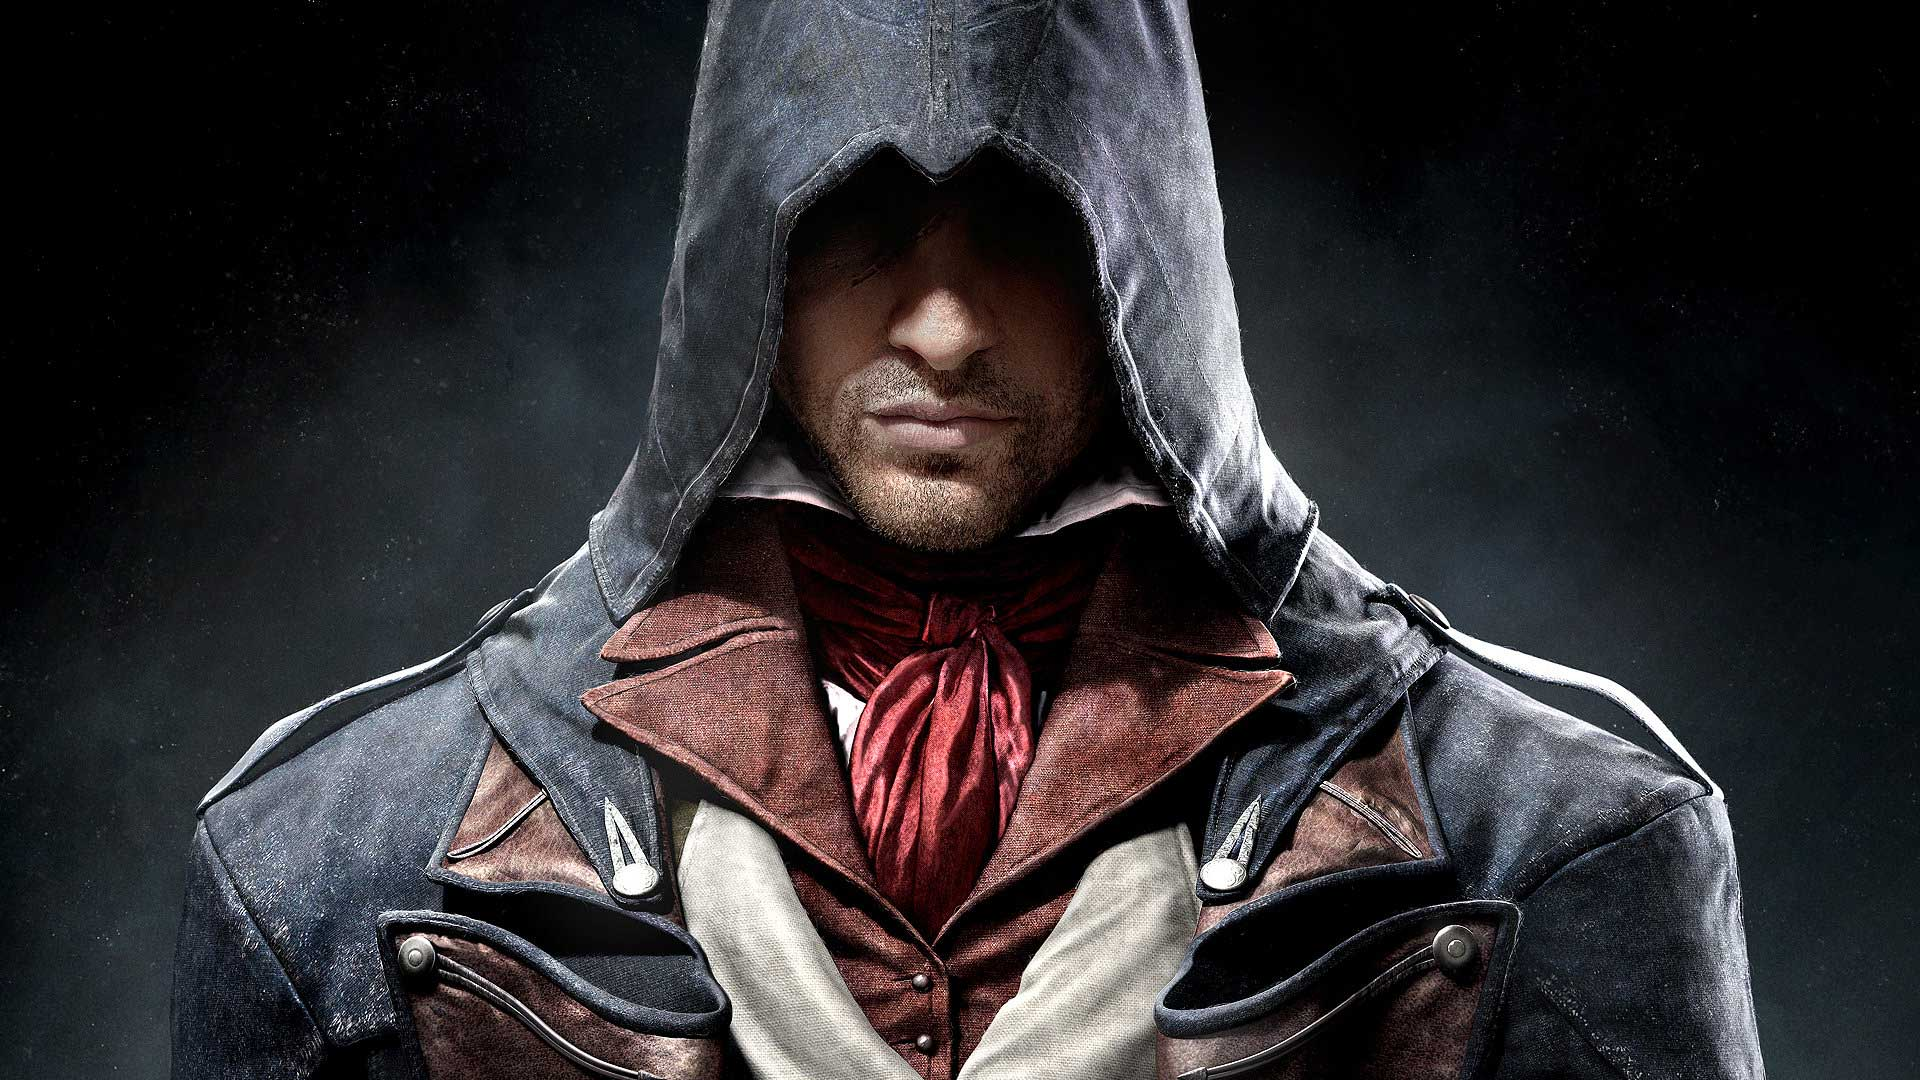 Руководство по загадке Нострадамуса в игре Assassin's Creed Unity (Овен)